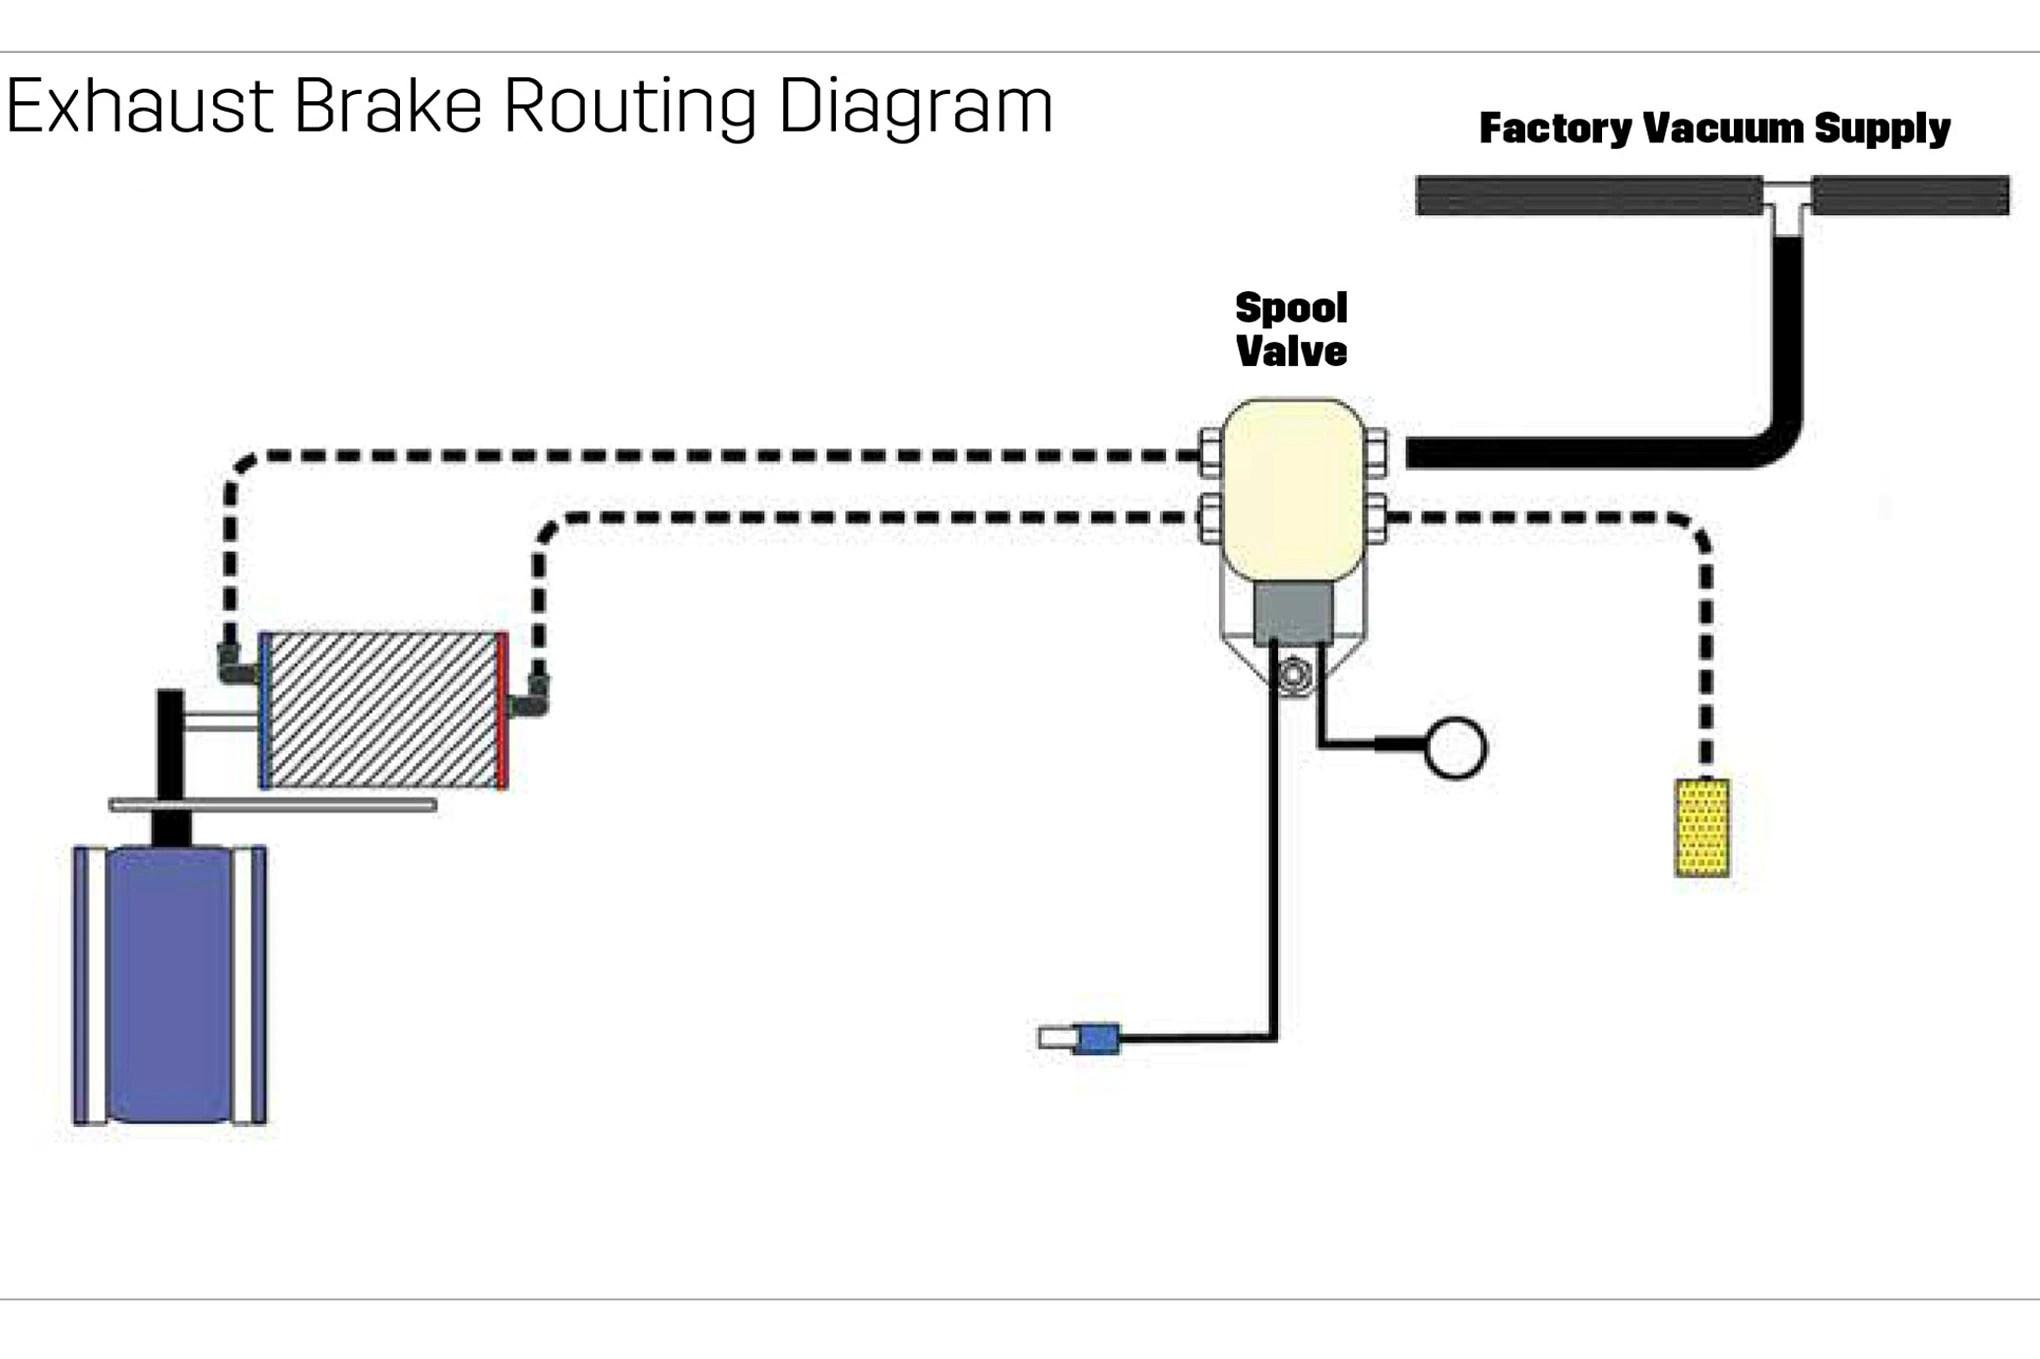 hight resolution of diagram exhaust brake